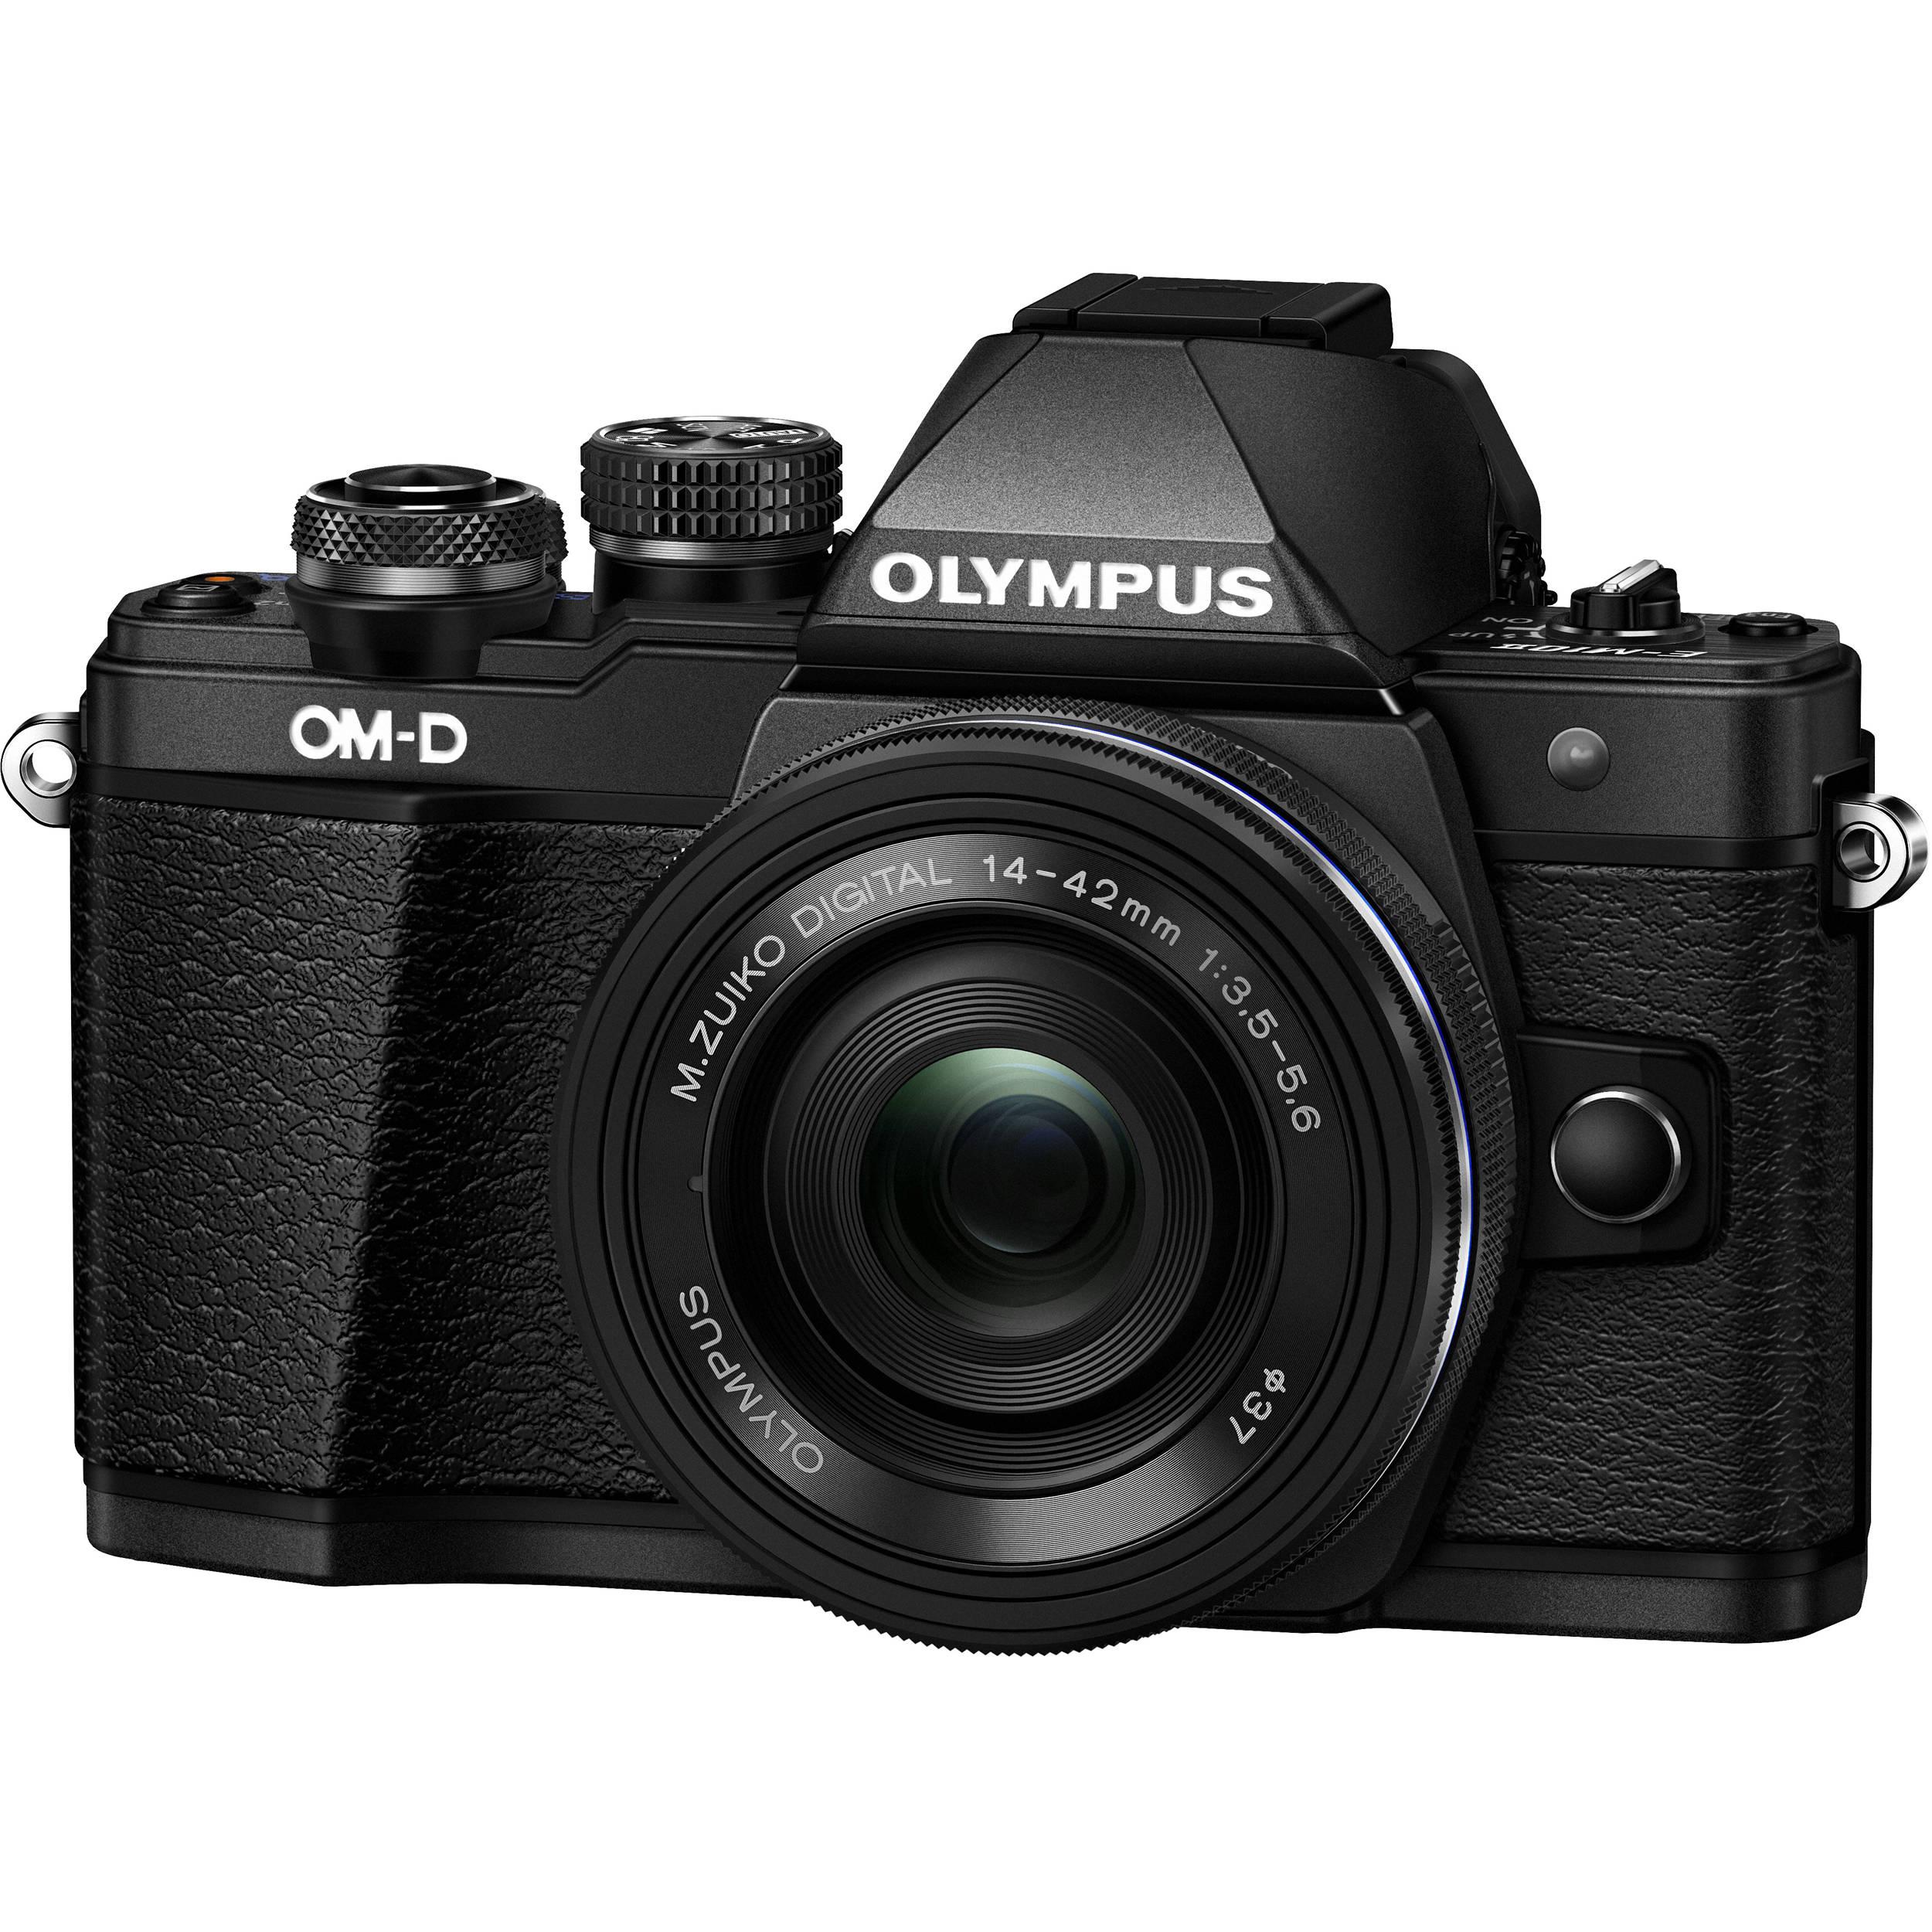 Olympus OM-D E-M10 Mark II EZ